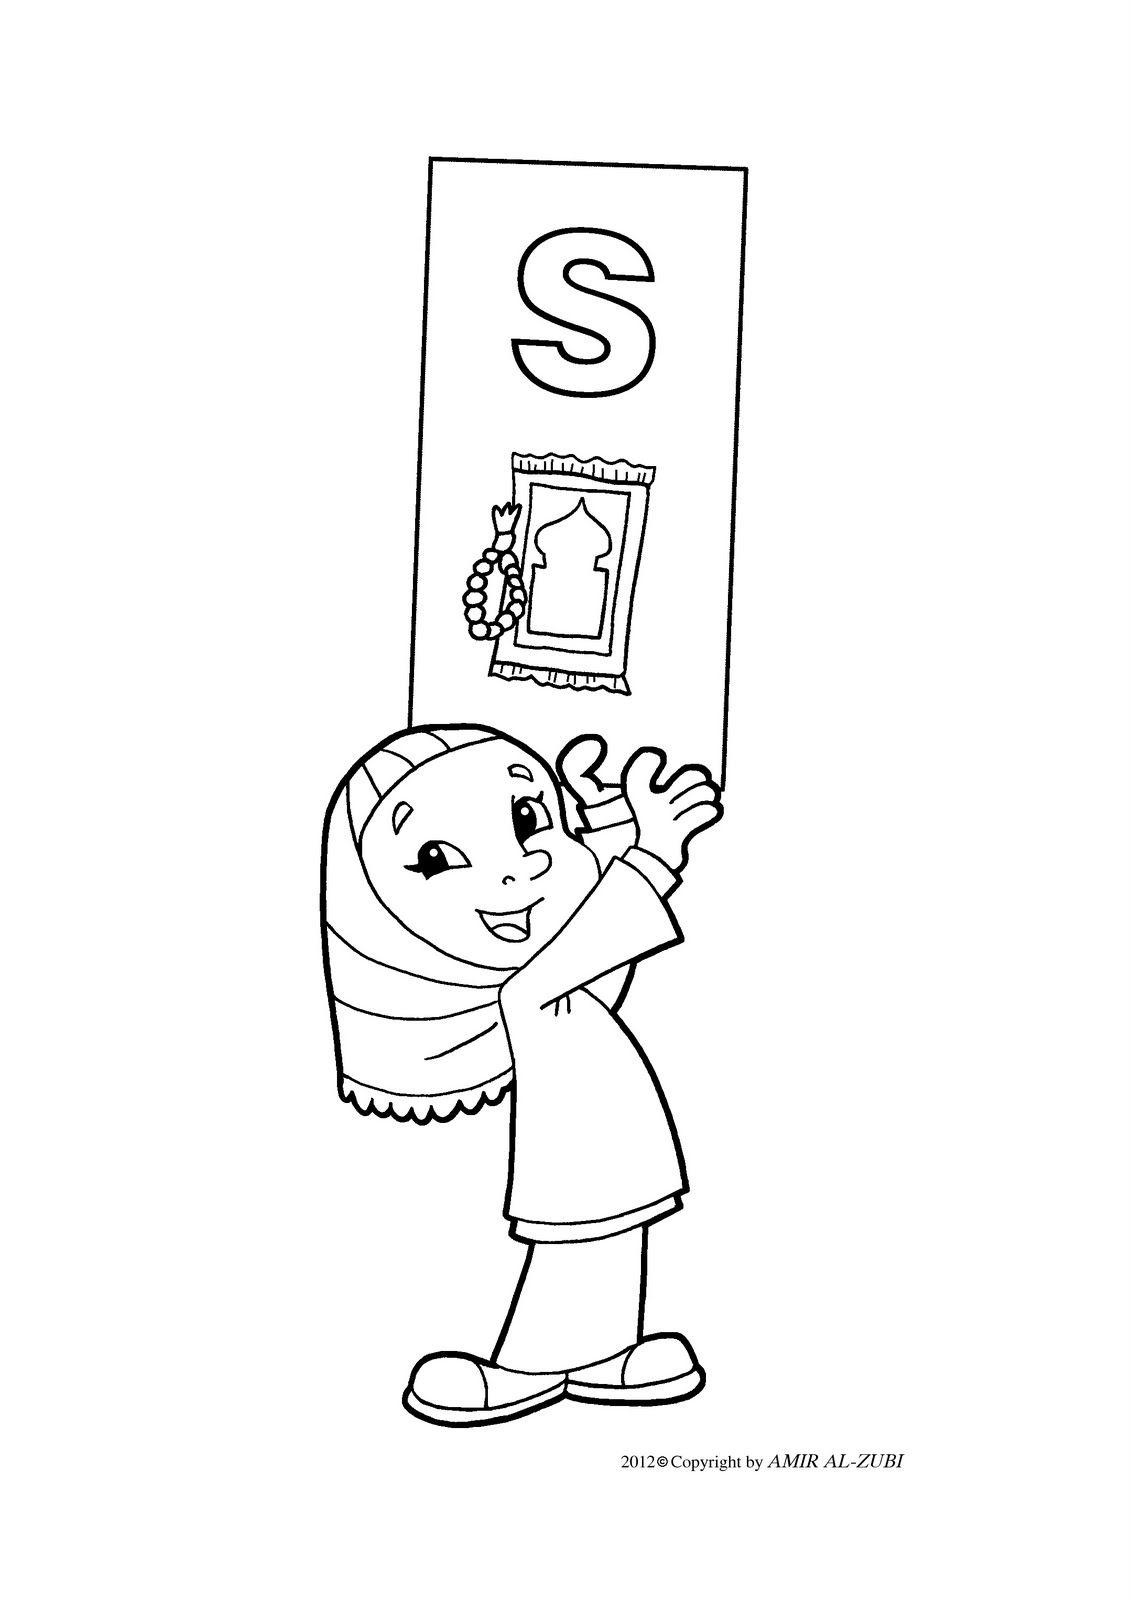 Muslim Kids 240 Jpg 1131 1600 Islam Onderwijs Knutselen